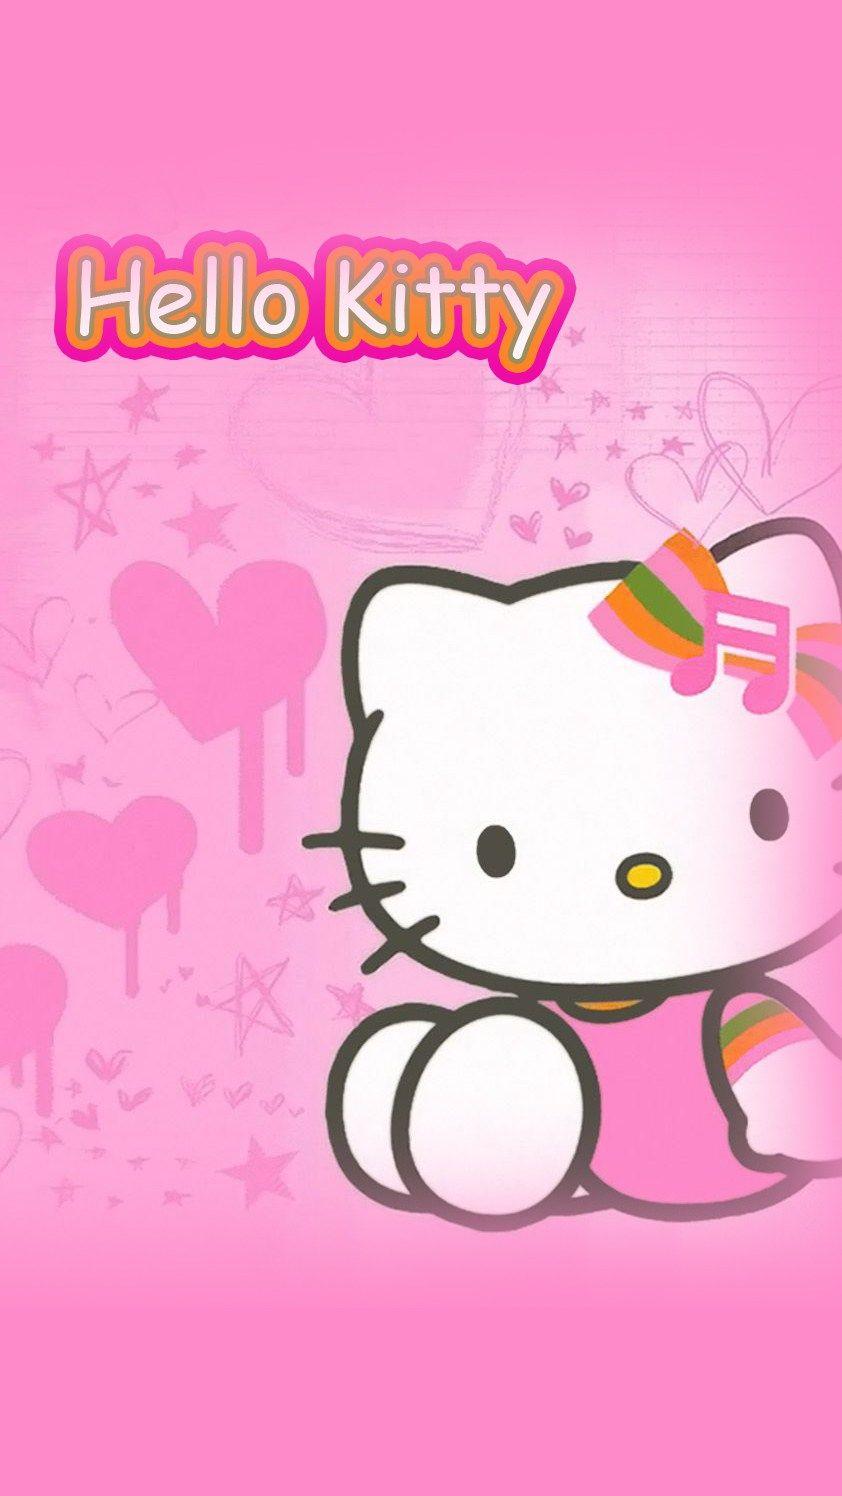 Gambar Wallpaper Hello Kitty Untuk Hp Android Gambar Hello